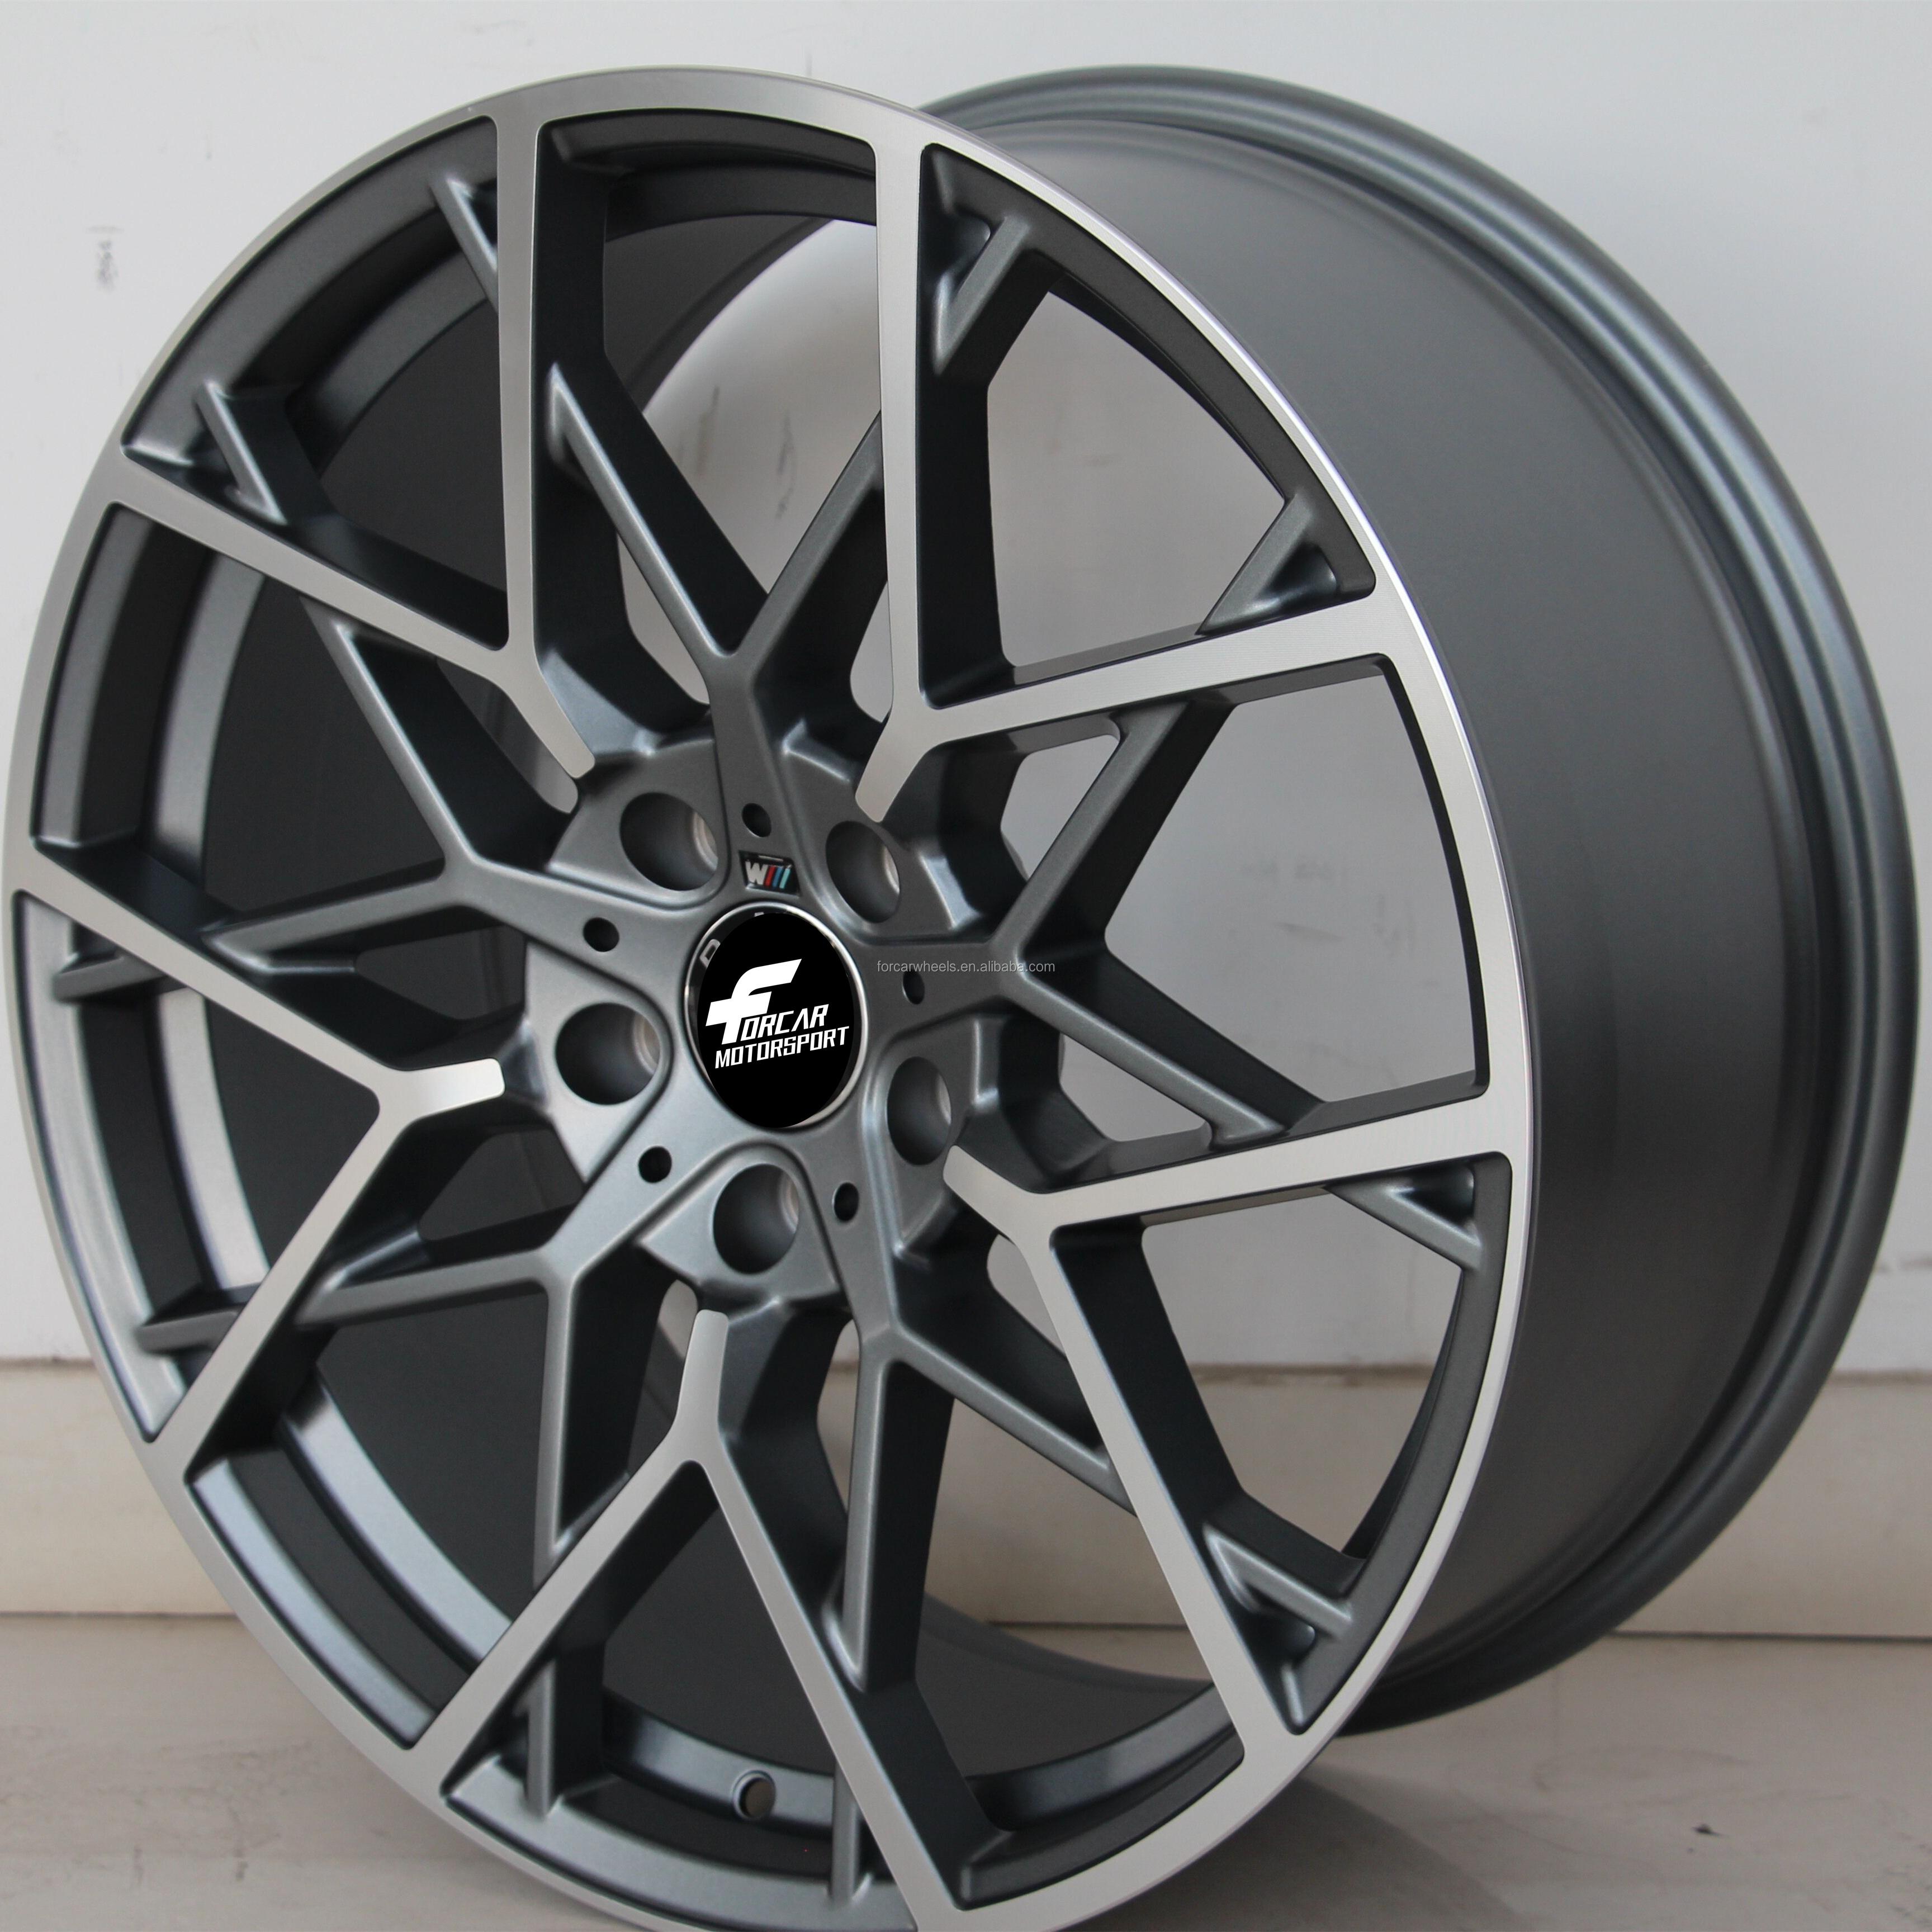 2020 Replica 5 120 Alloy Wheels For Bmw Buy Alloy Wheels 19 Inch 5x120 Alloy Wheel 5x120 65 Staggered Alloy Wheels Product On Alibaba Com